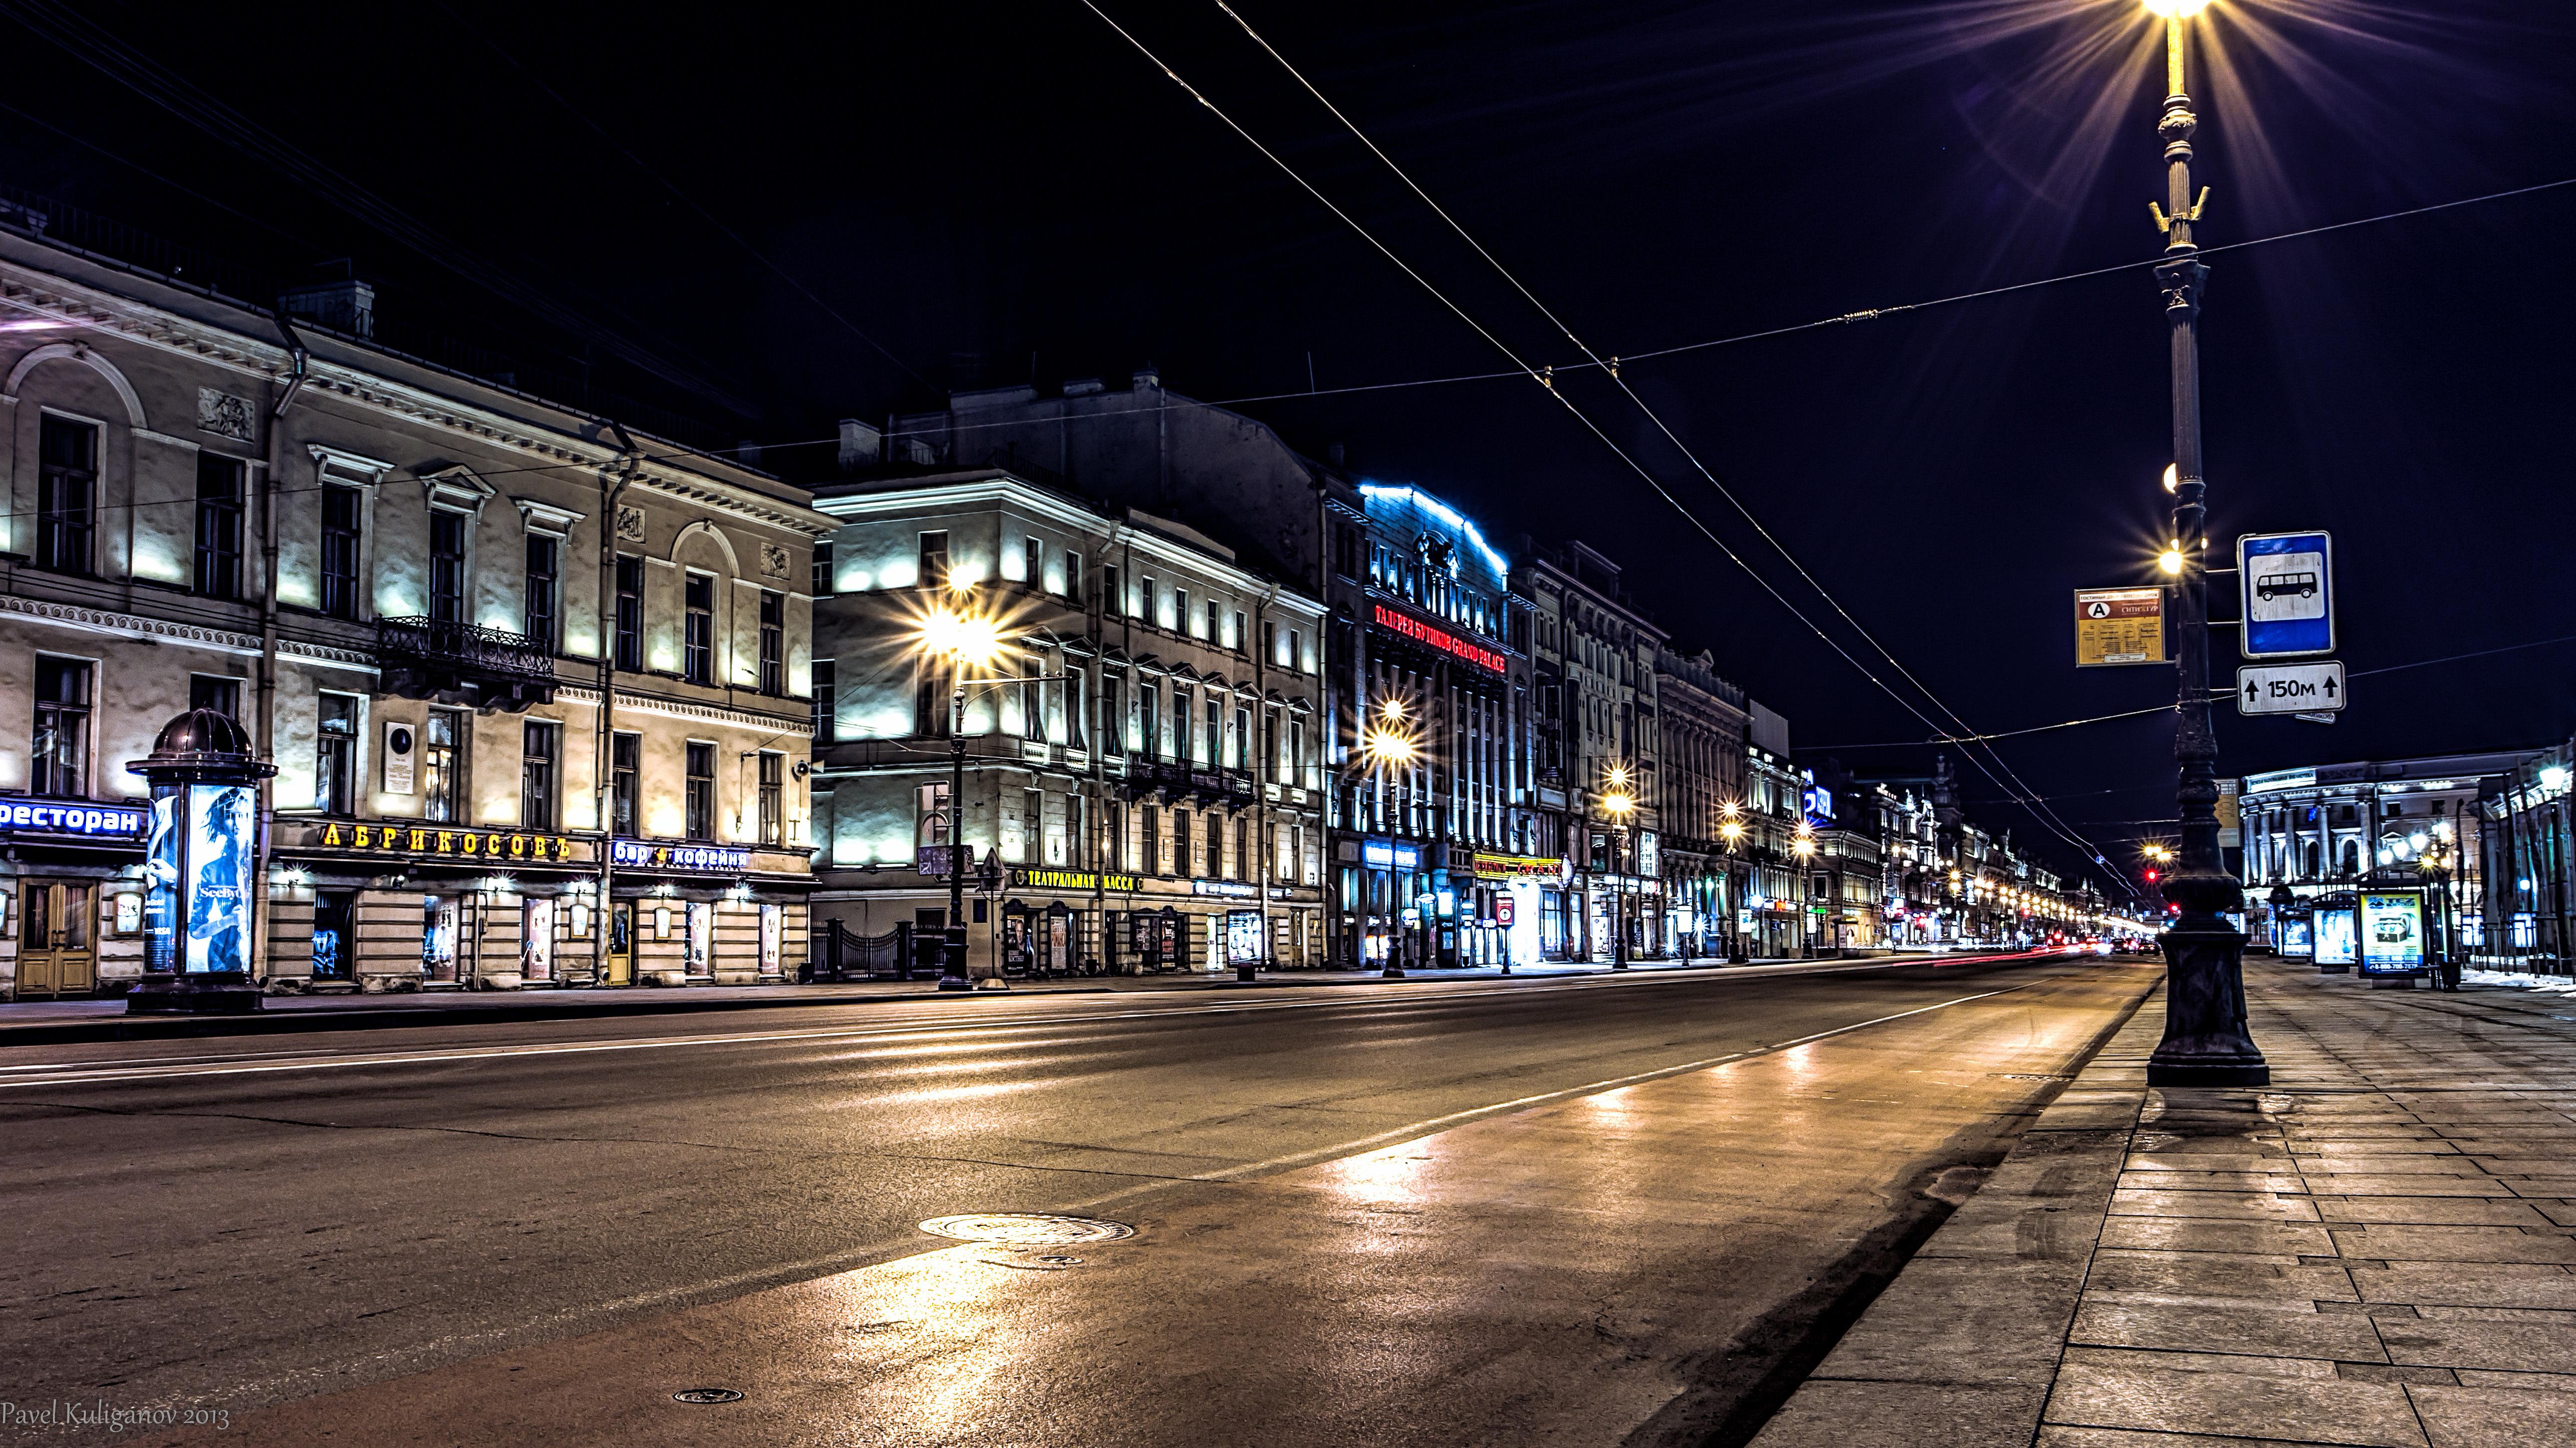 Man Made Saint Petersburg 5163x2903